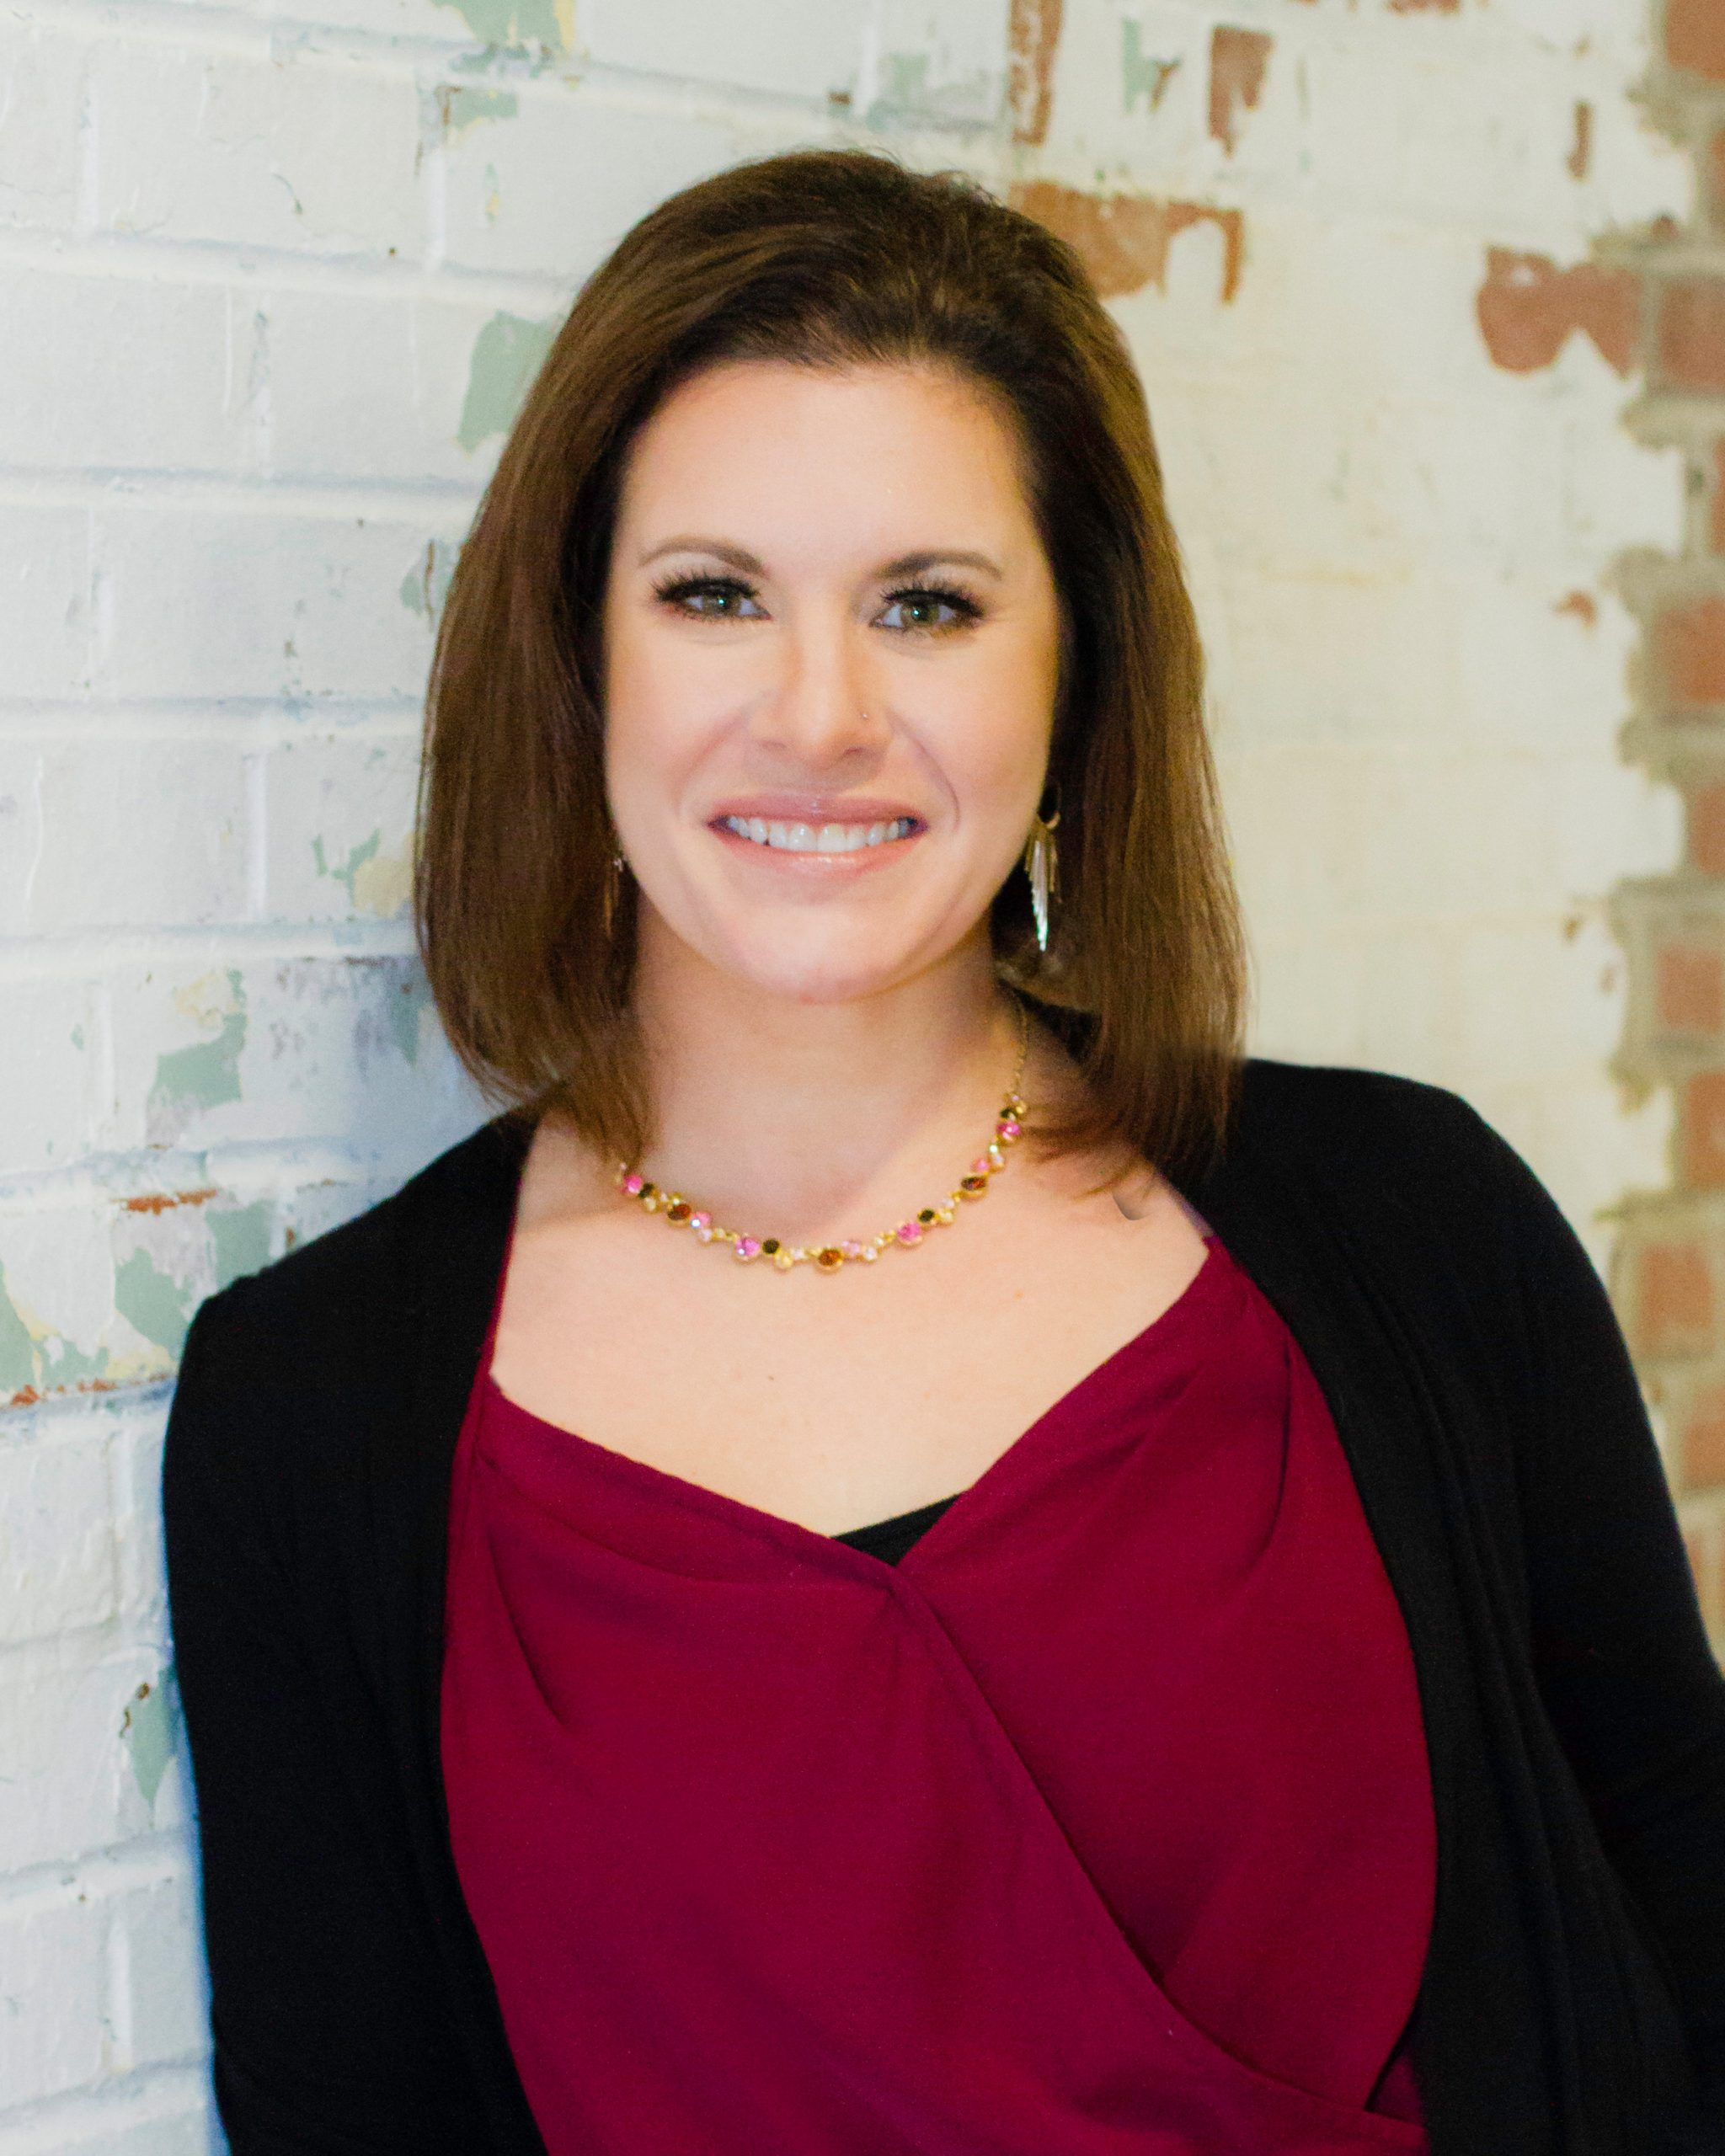 Janelle M. Fleck, M.A.Ed., LCMHC